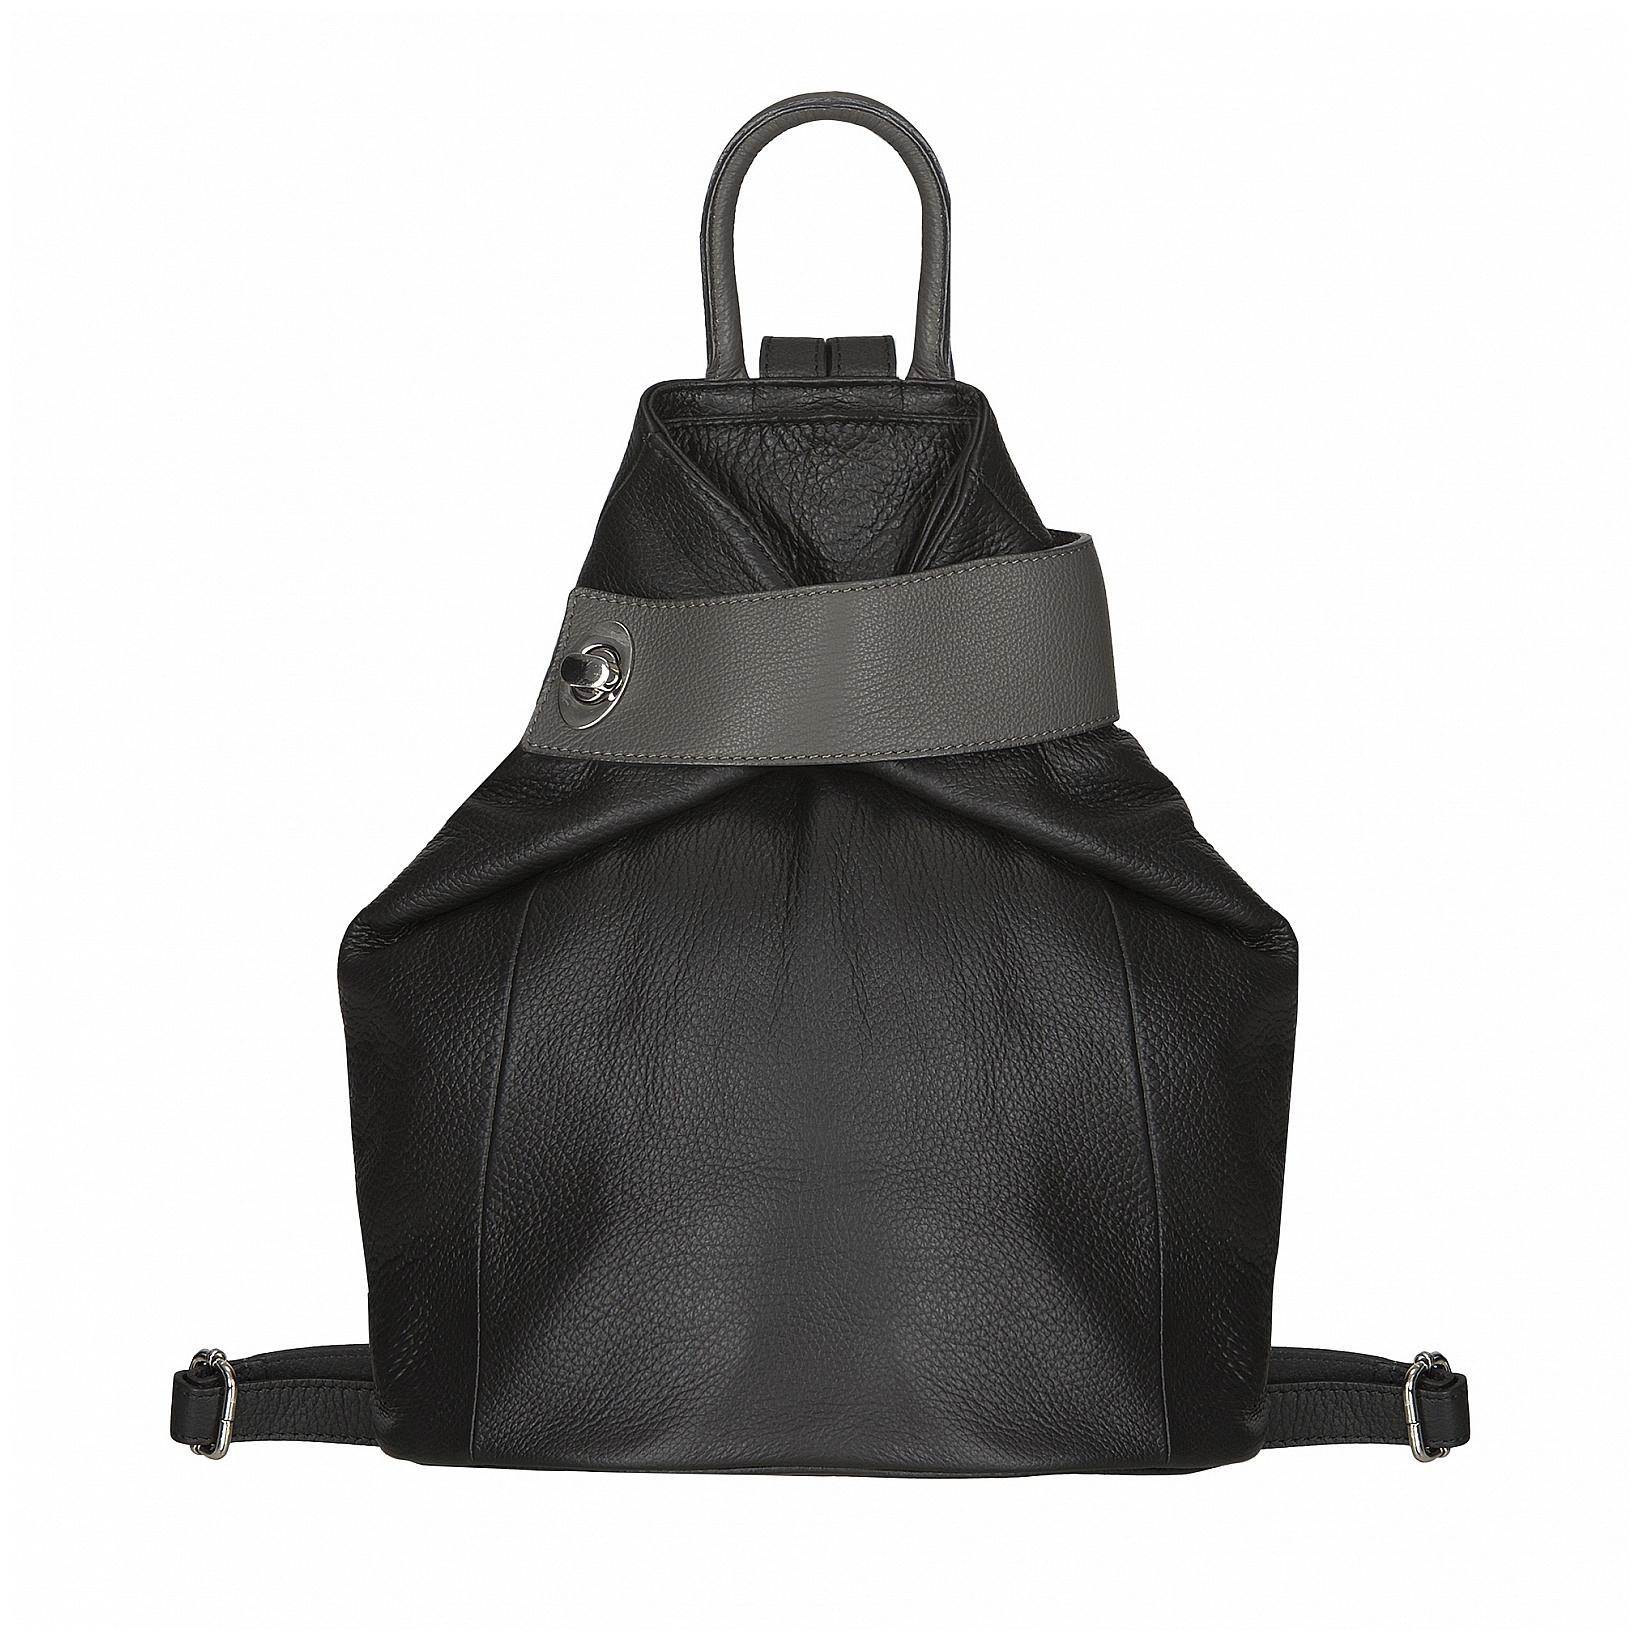 ESTELLE Dámský kožený batoh 0960 černo-šedý